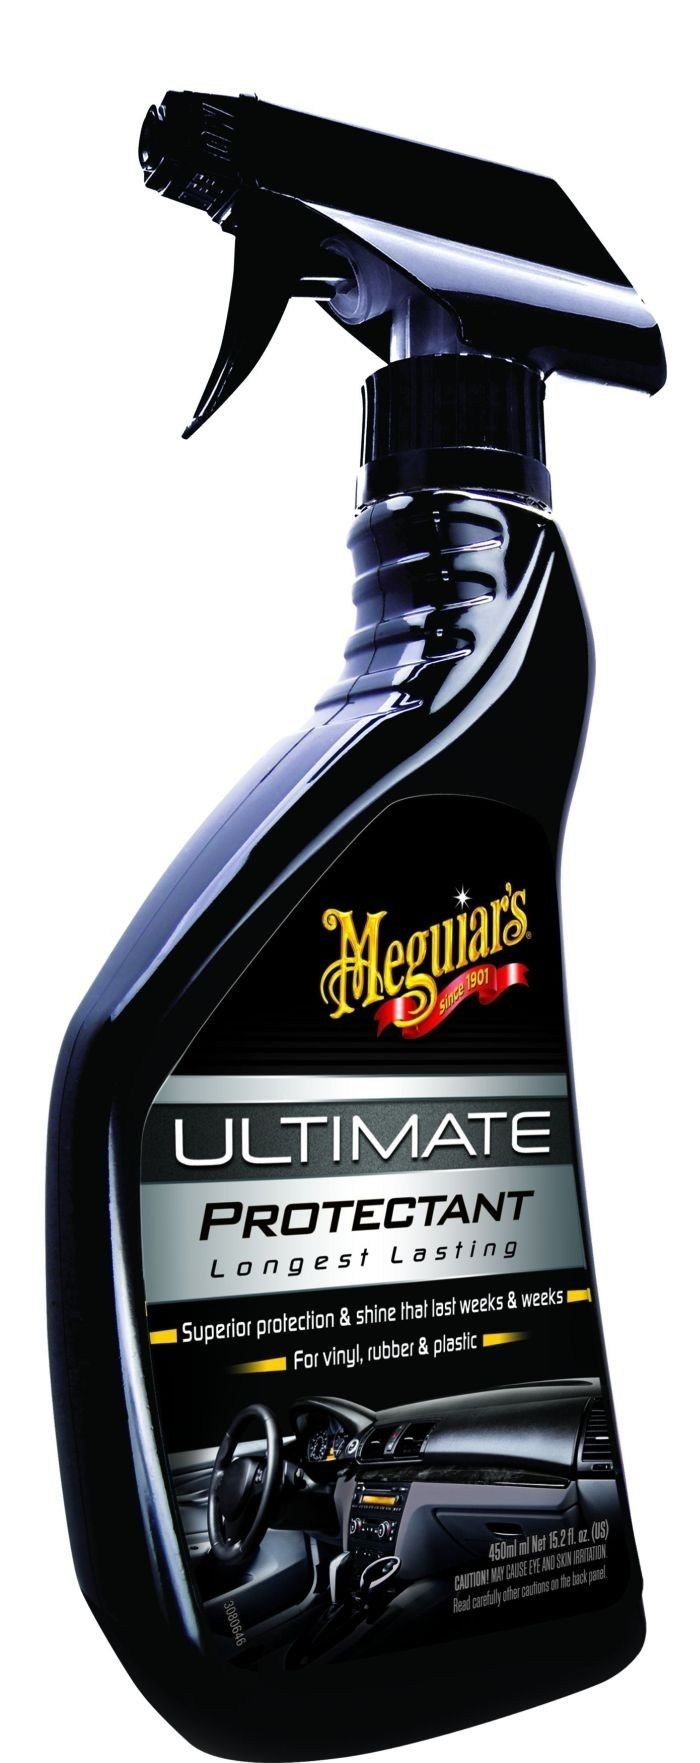 Meguiar's Ultimate Protectant Spray - Kilau yang kaya warna - jual eceran dengan harga lebih murah  Kering dengan cepat dan tidak benrminyak Tahan terhadap pencucian dan hujan terhadap trim tanpa meninggalkan baret  http://tokomeguiars.com/interior/65-jual-meguiars-meguiar-s-ultimate-protectant-spray-kilau-yang-kaya-warna-jual-eceran-dengan-harga-lebih-murah.html  #meguiars #ultimateprotectant #pemolesinteriormobil